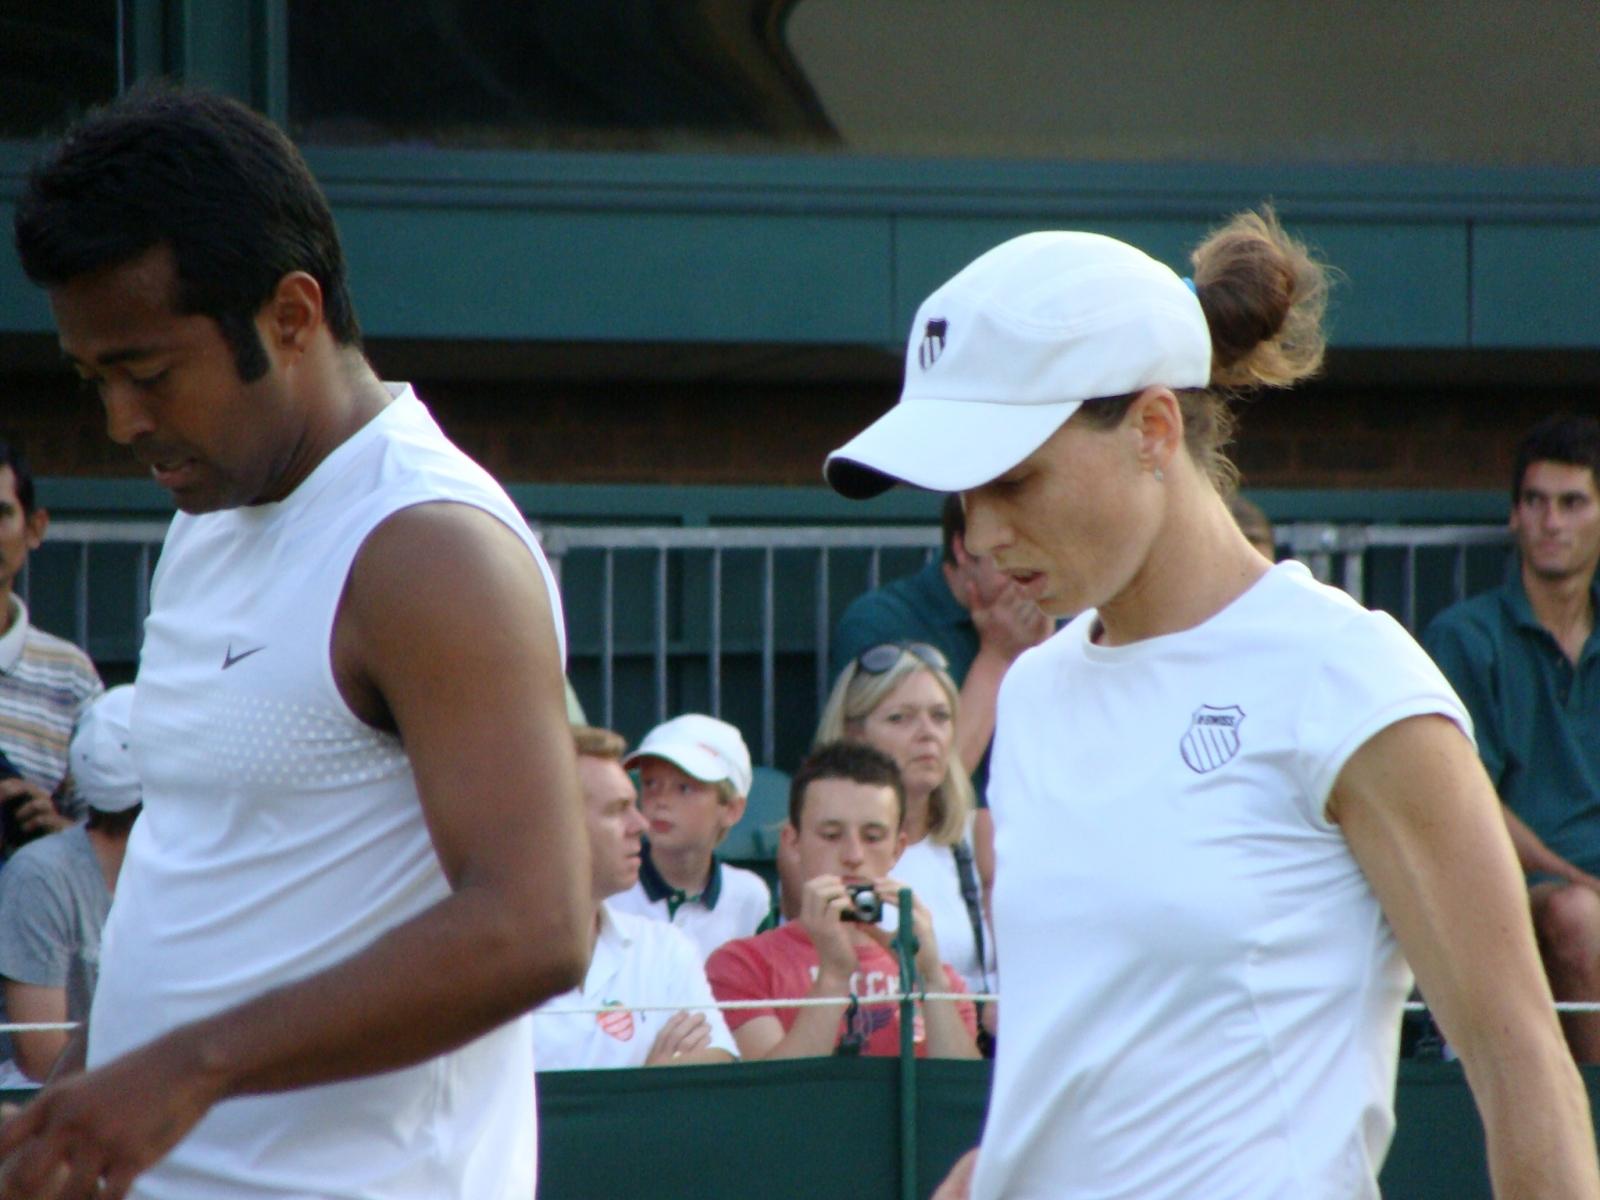 24_Paes Black Wimbledon 2009